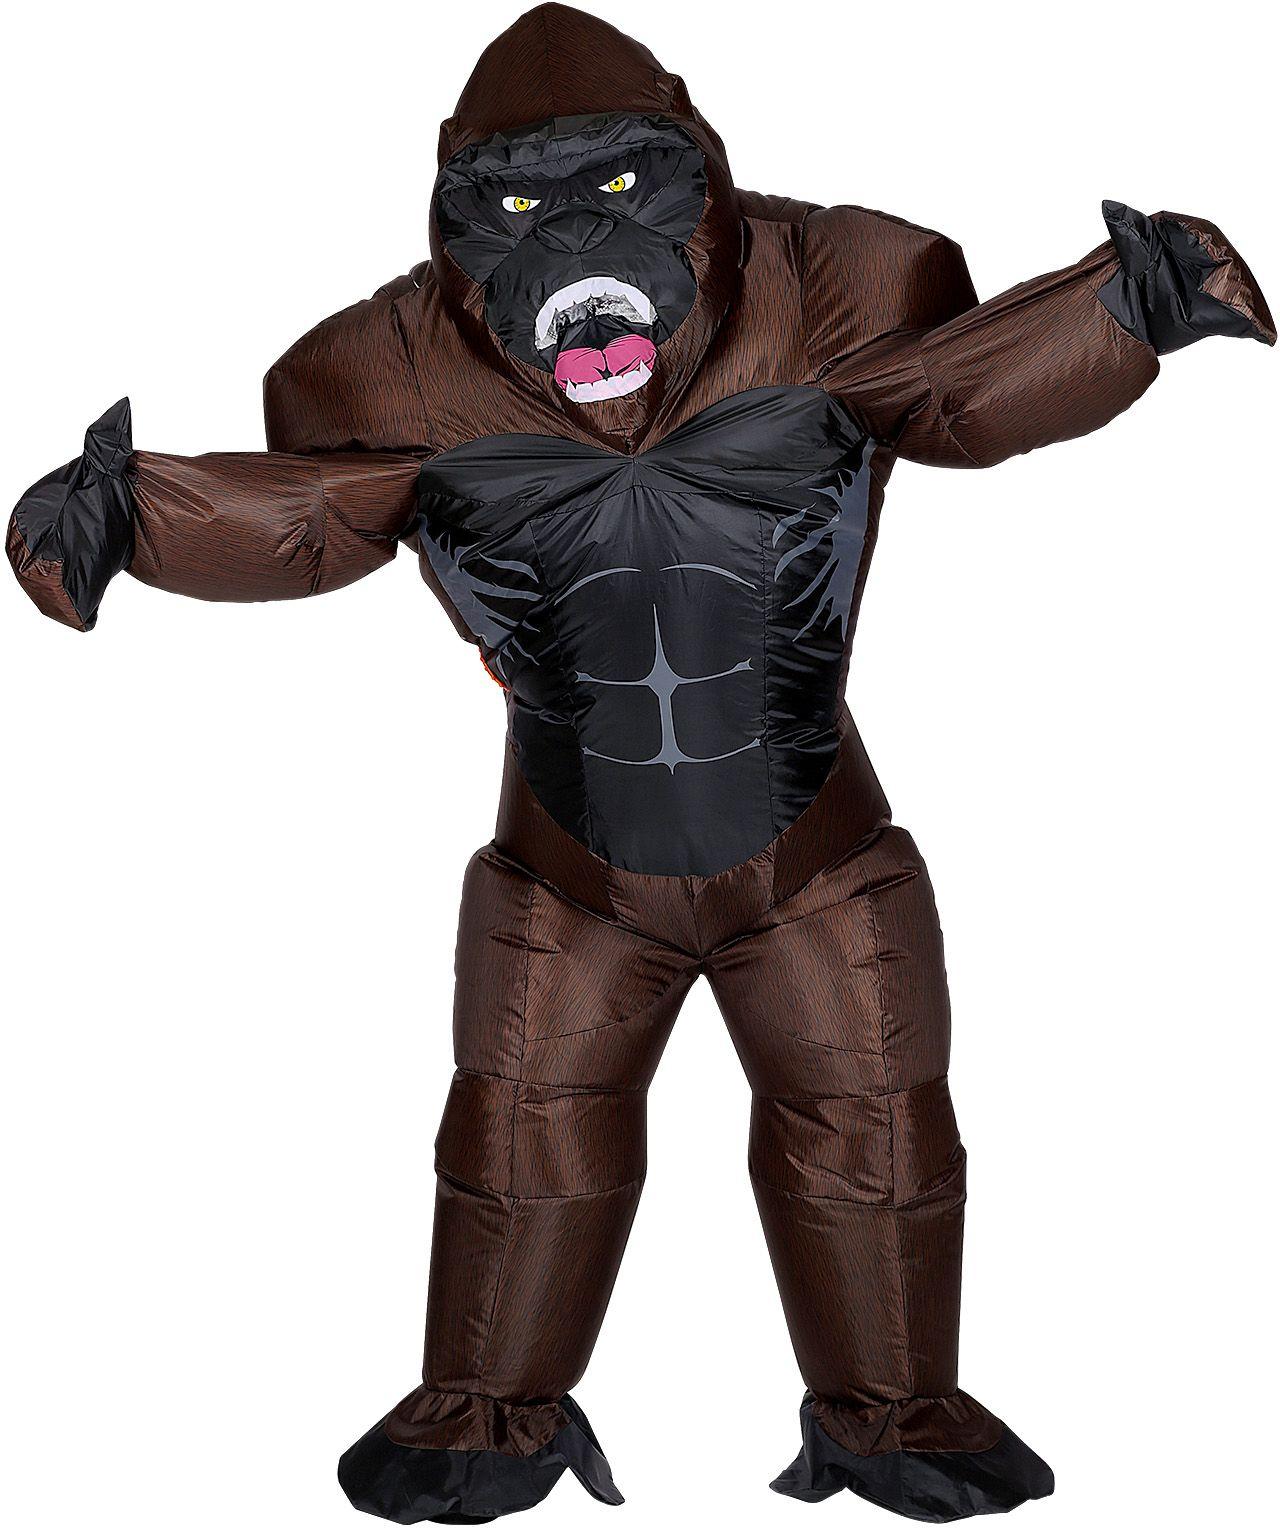 Opblaasbaar gorilla kostuum